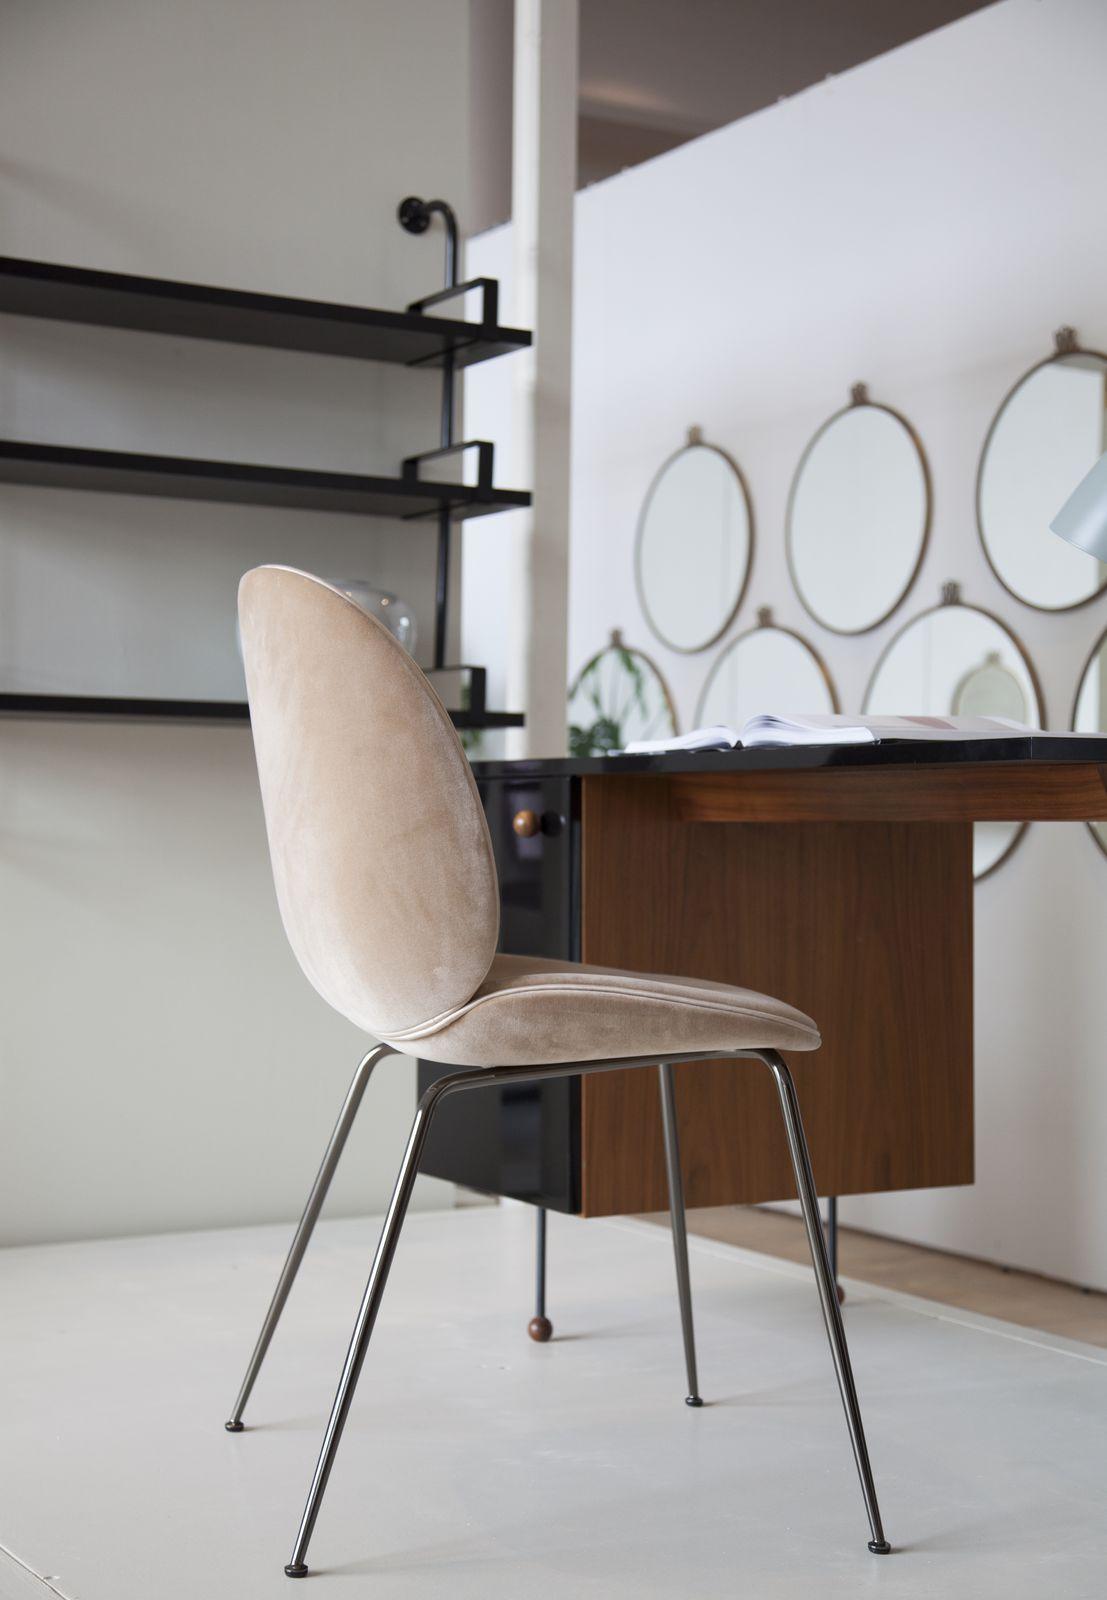 Gubi Beetle Chair And Grossman Desk Chaise